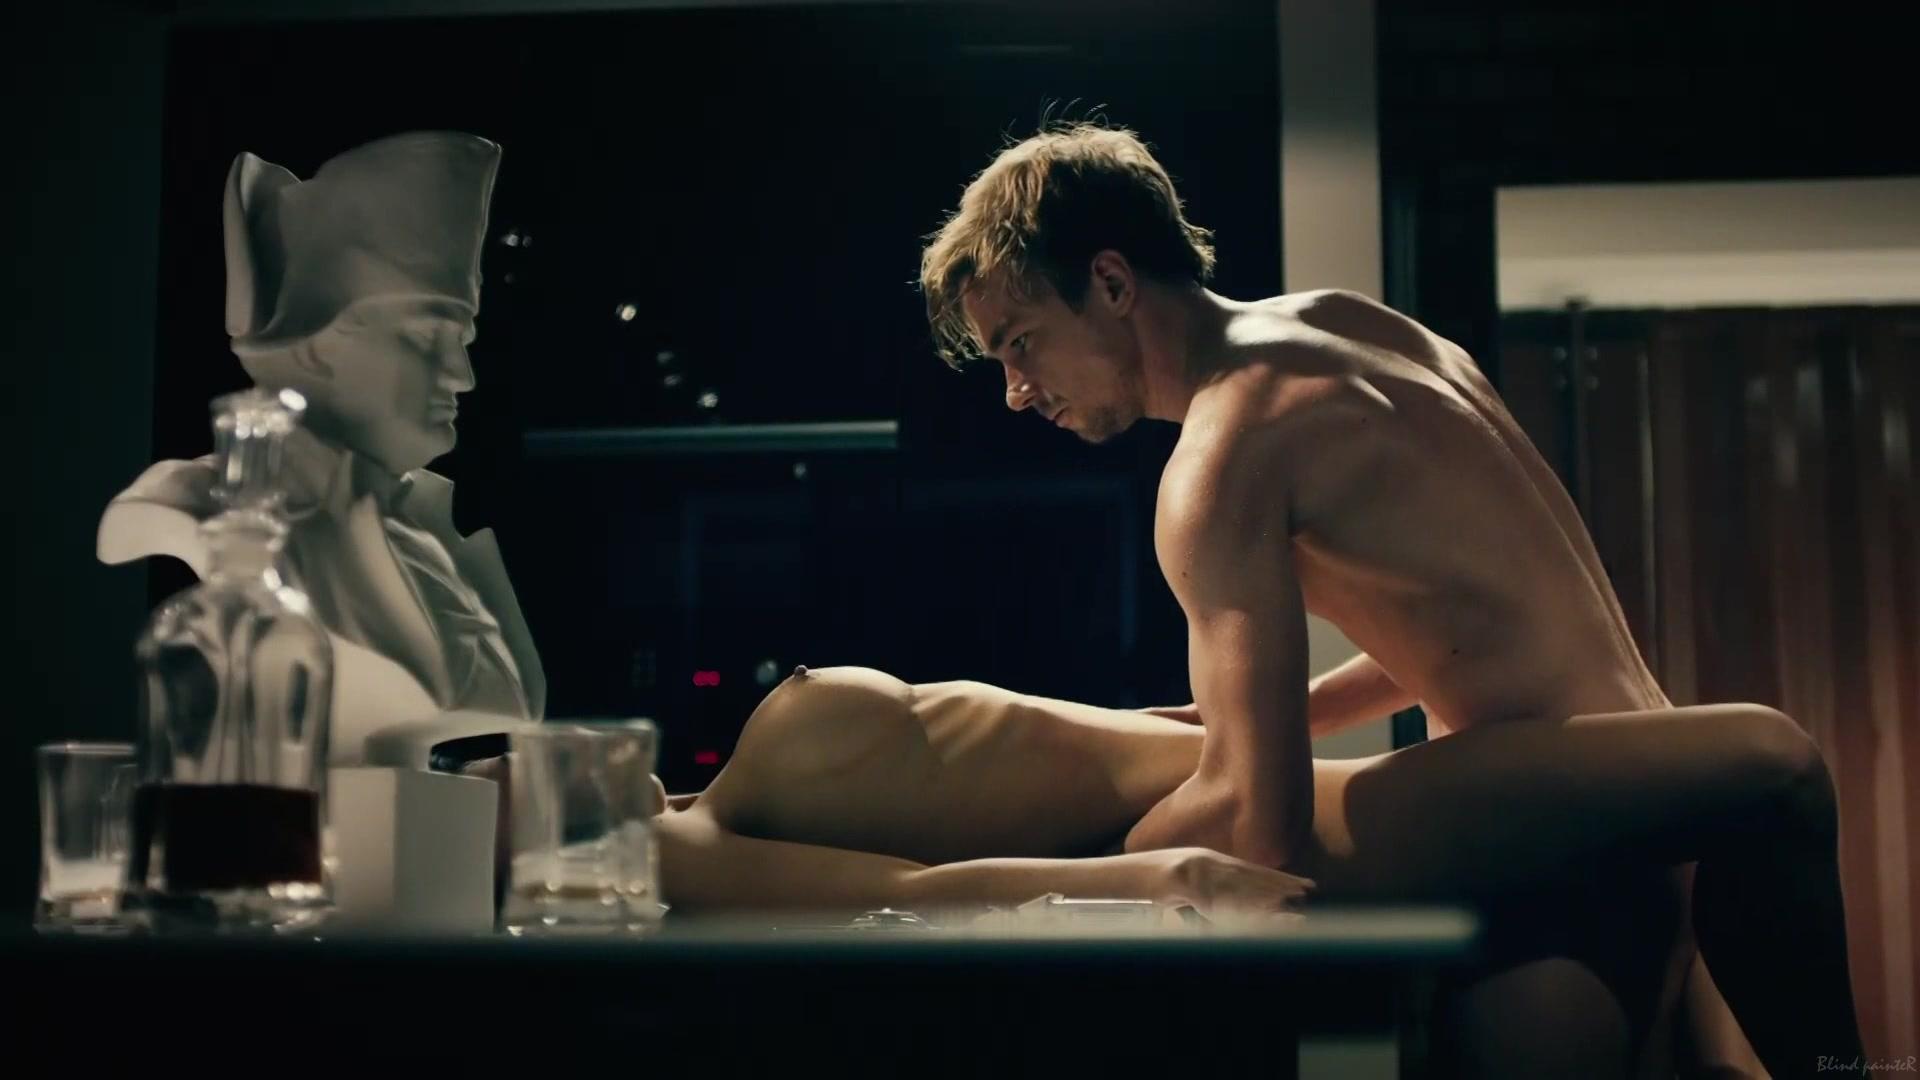 Lisi linder naked sex in mar de plastico scandalplanetcom - 2 part 6